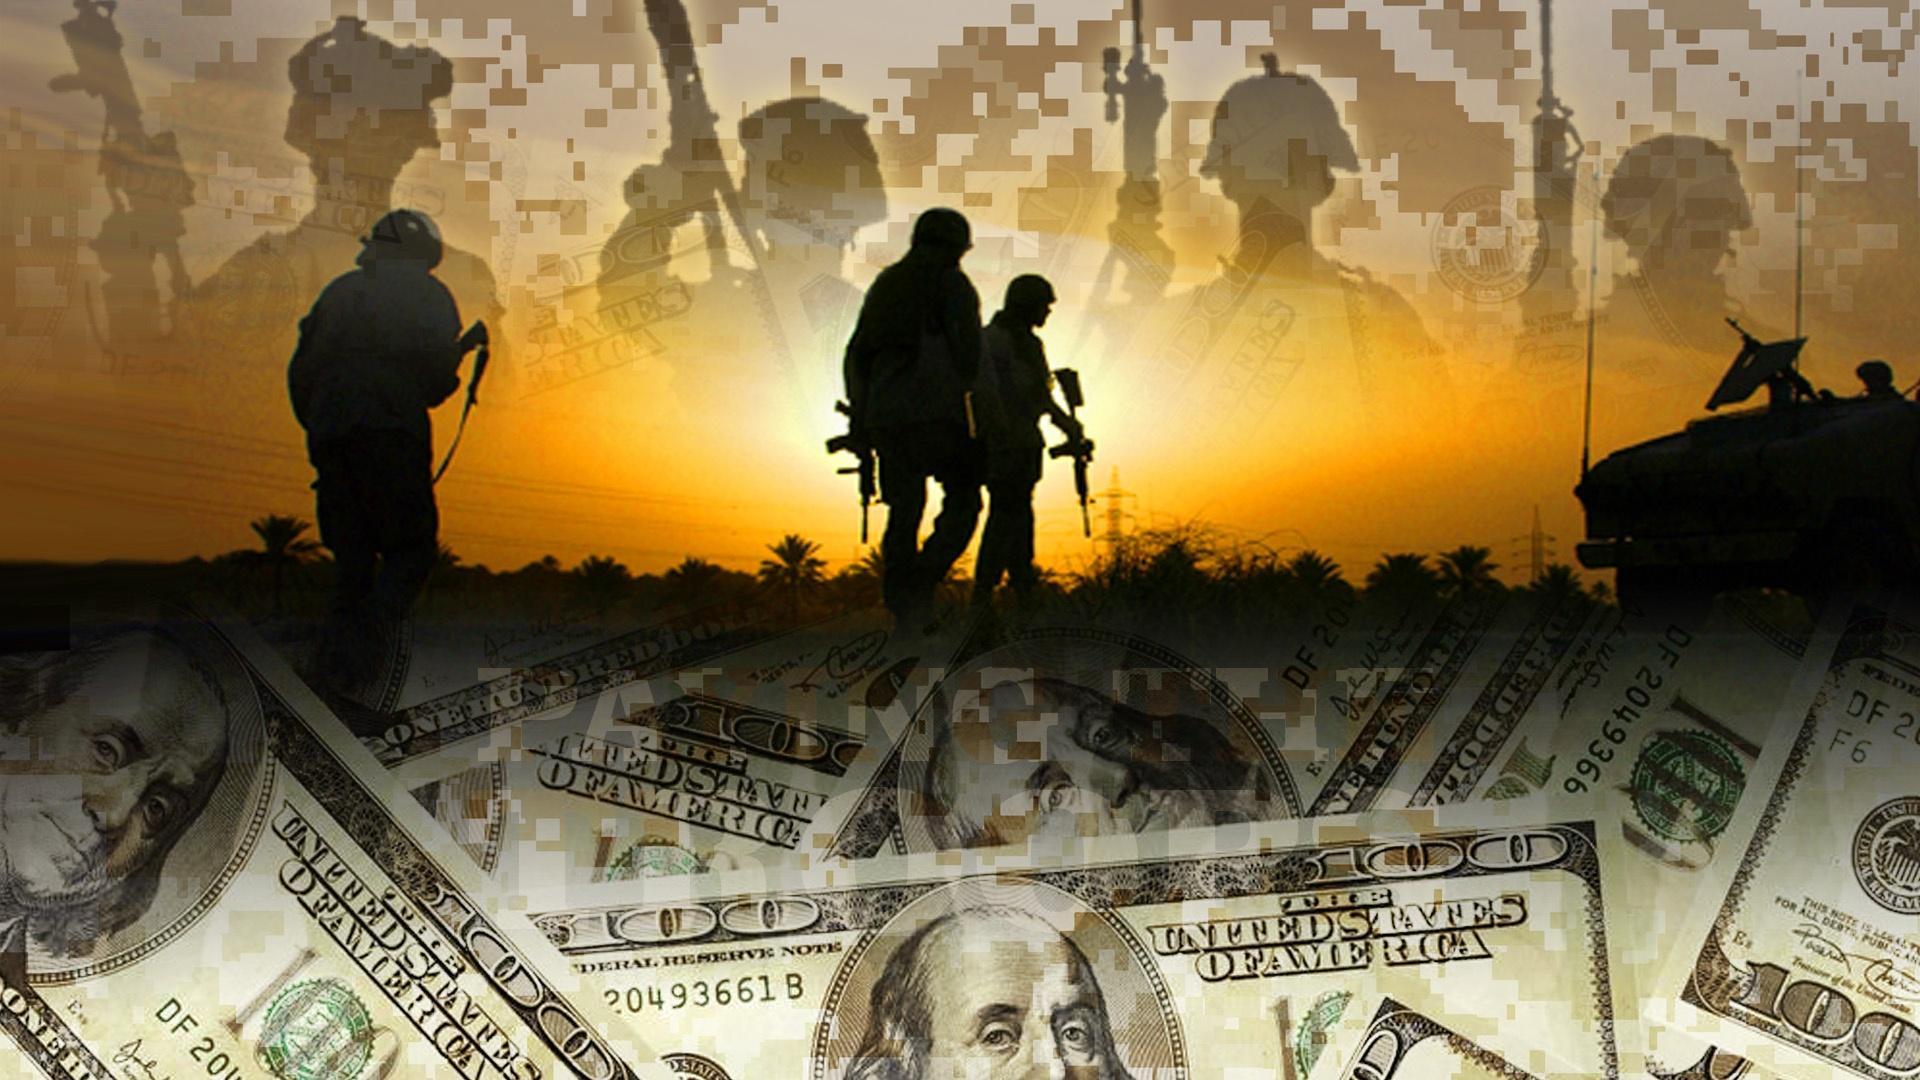 PBS NewsHour - 'American Sniper' provokes debate on Iraq, depictions